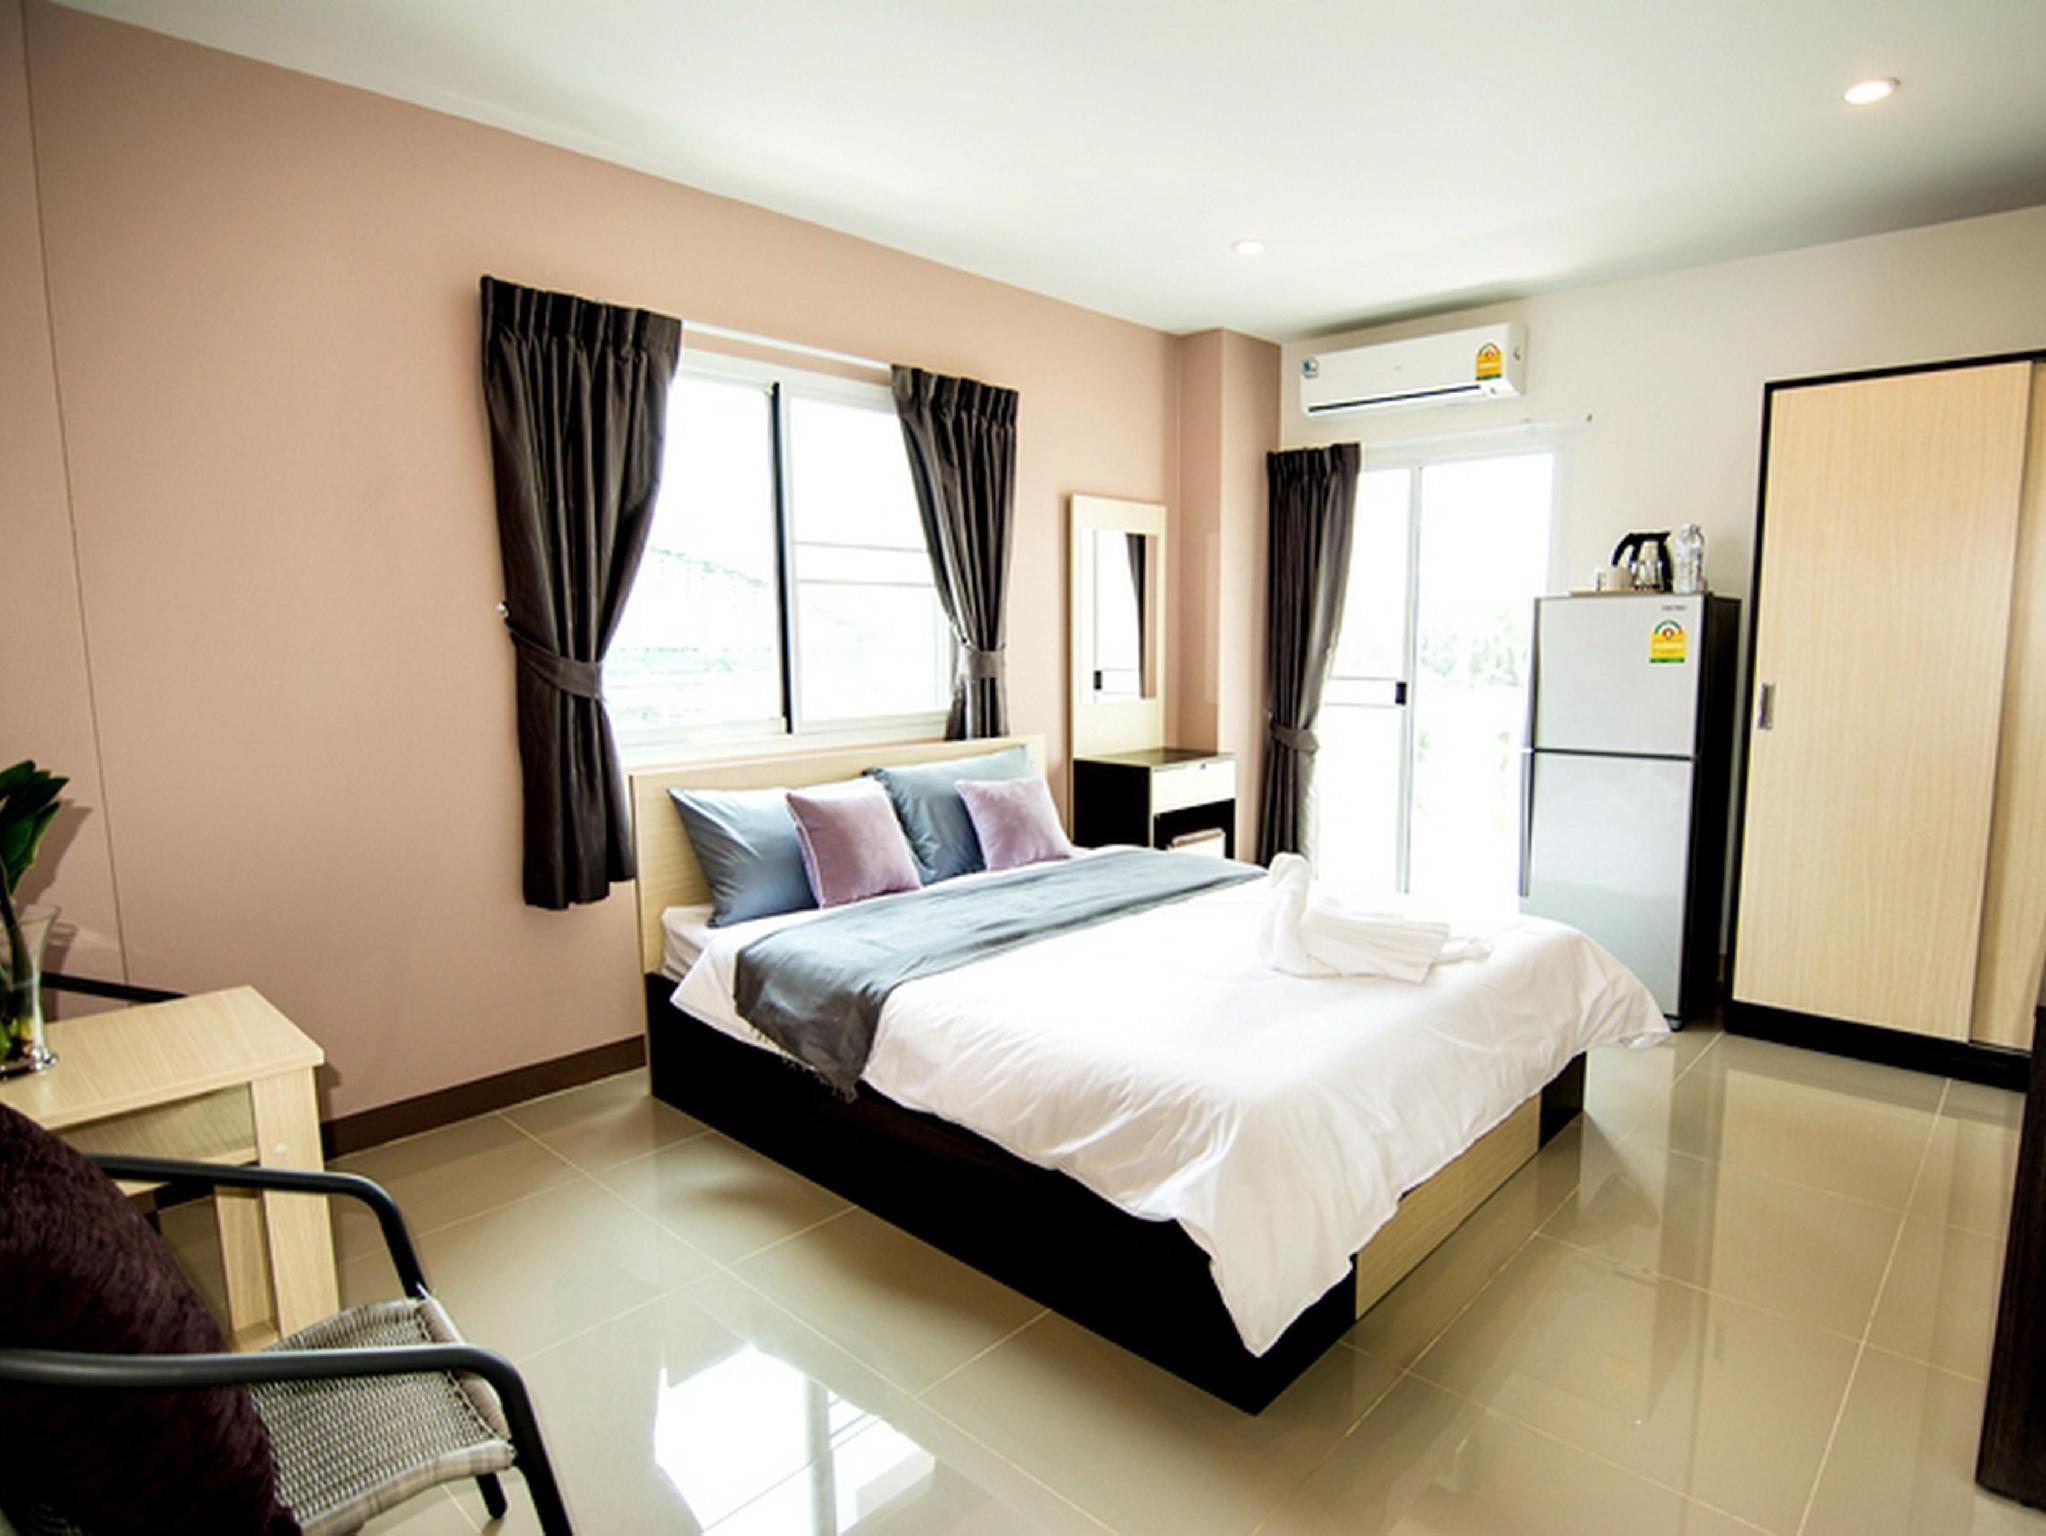 At Ease Residence Suvarnabhumi ,แอท อีส เรสซิเดนซ์ สุวรรรณภูมิ